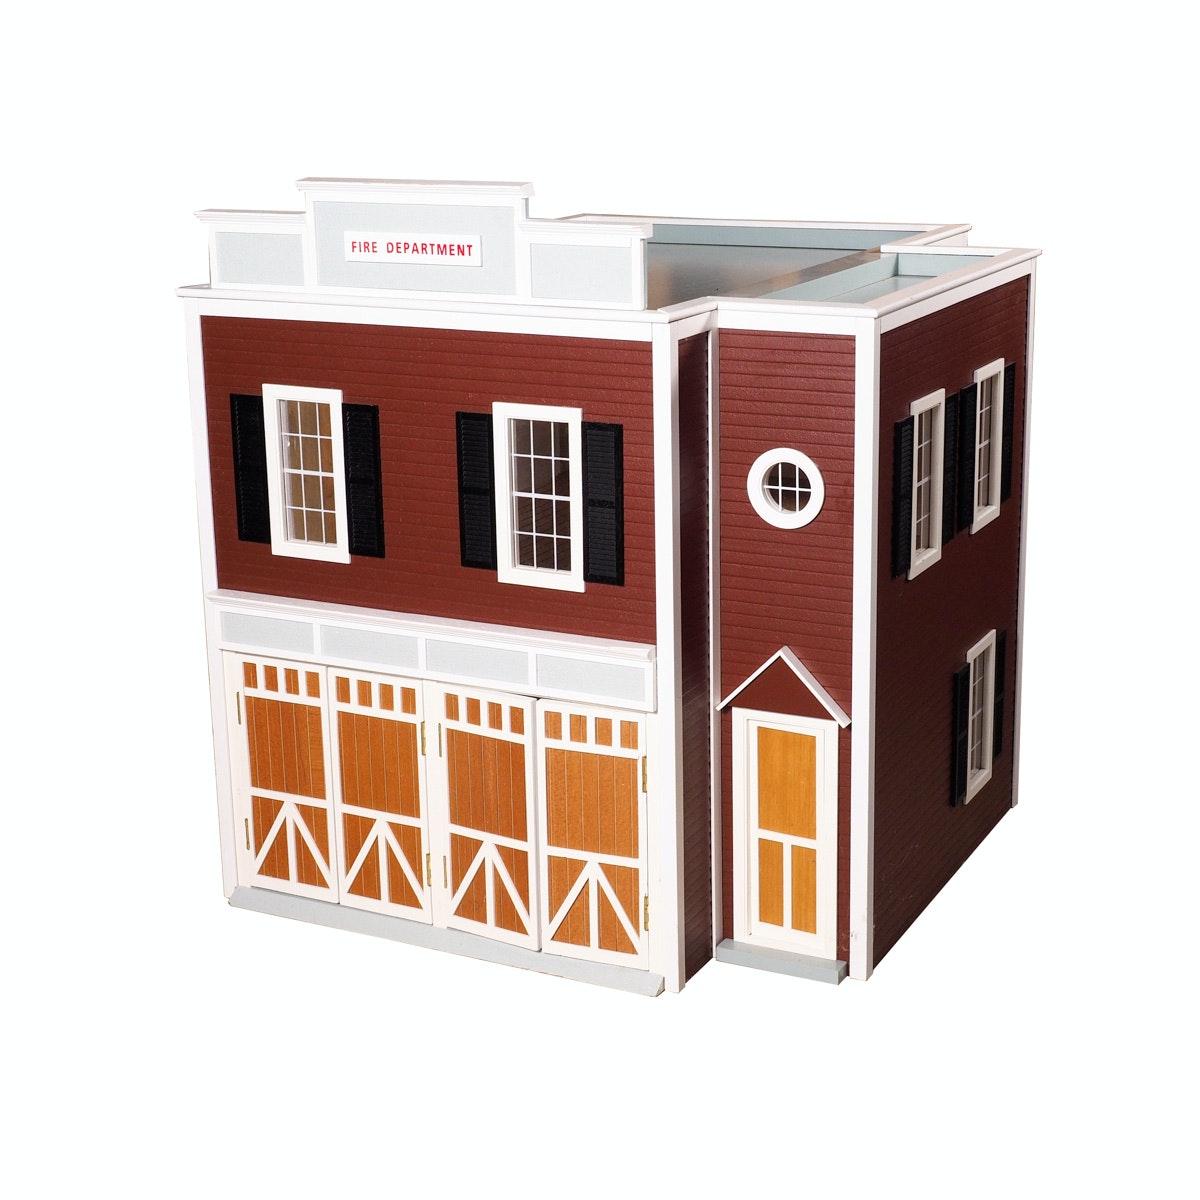 Fire Station Dollhouse